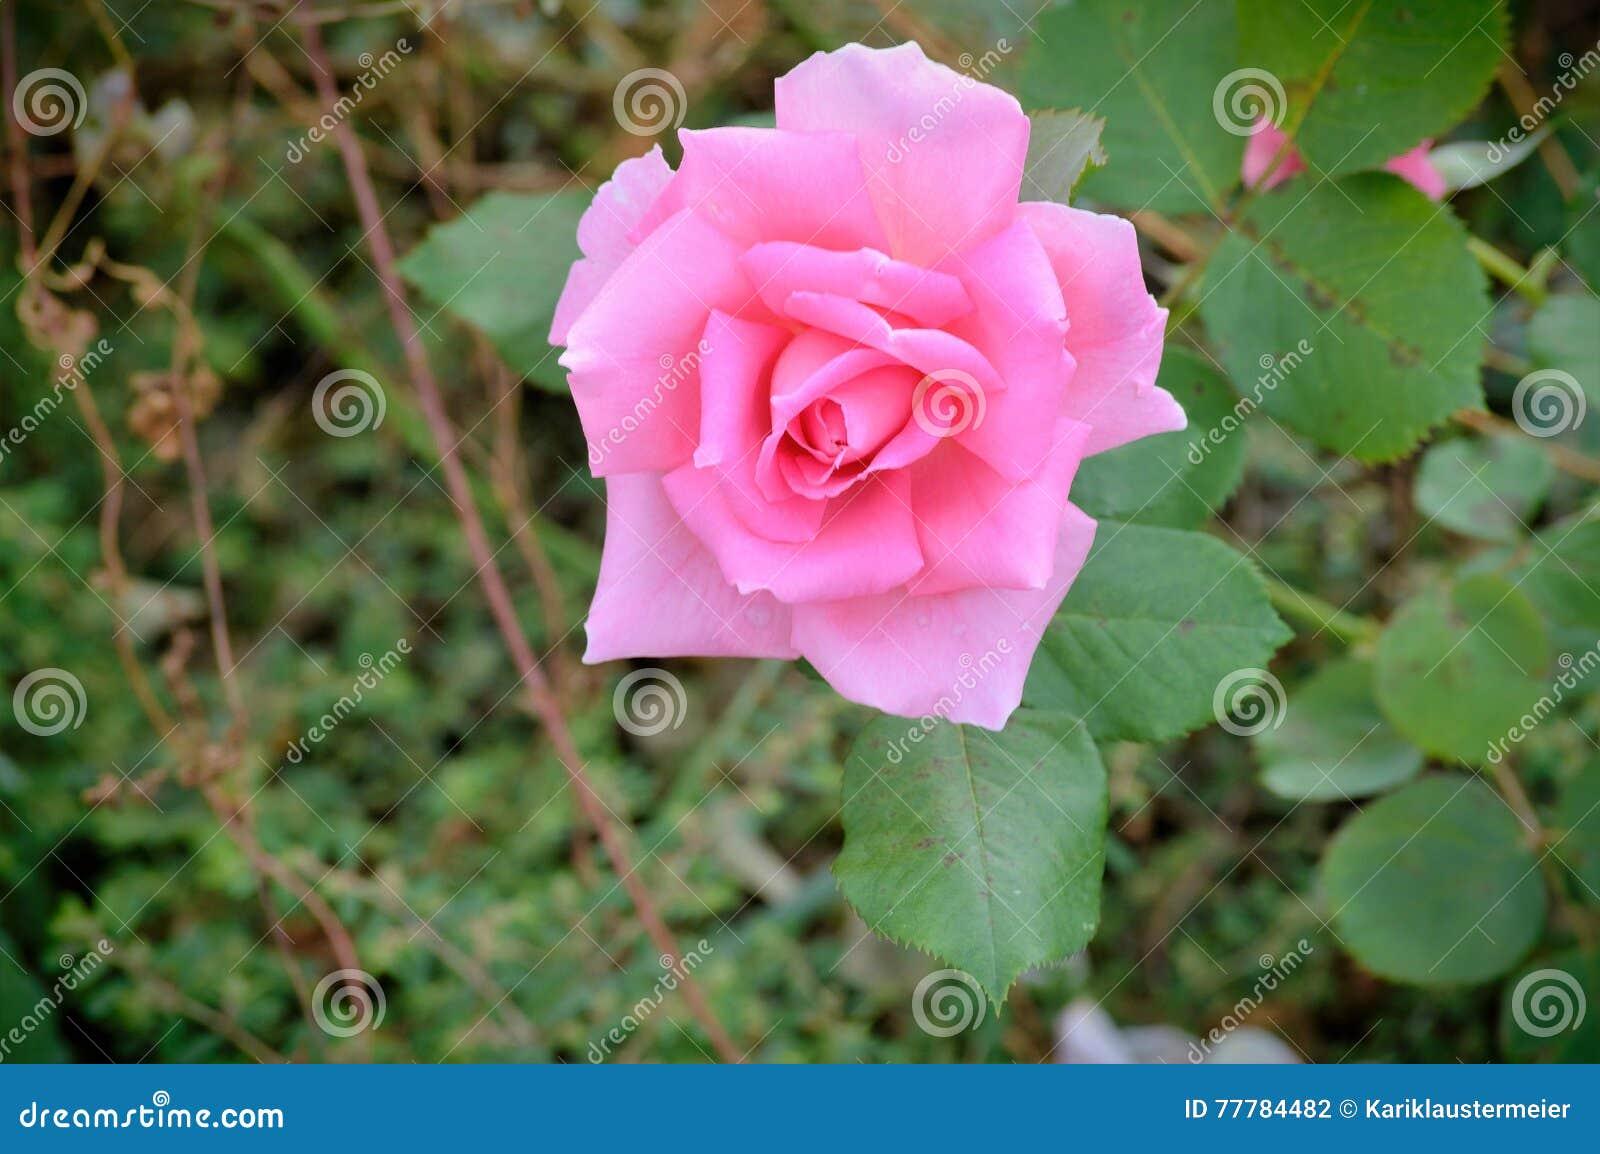 Rose bud relleno de sonido